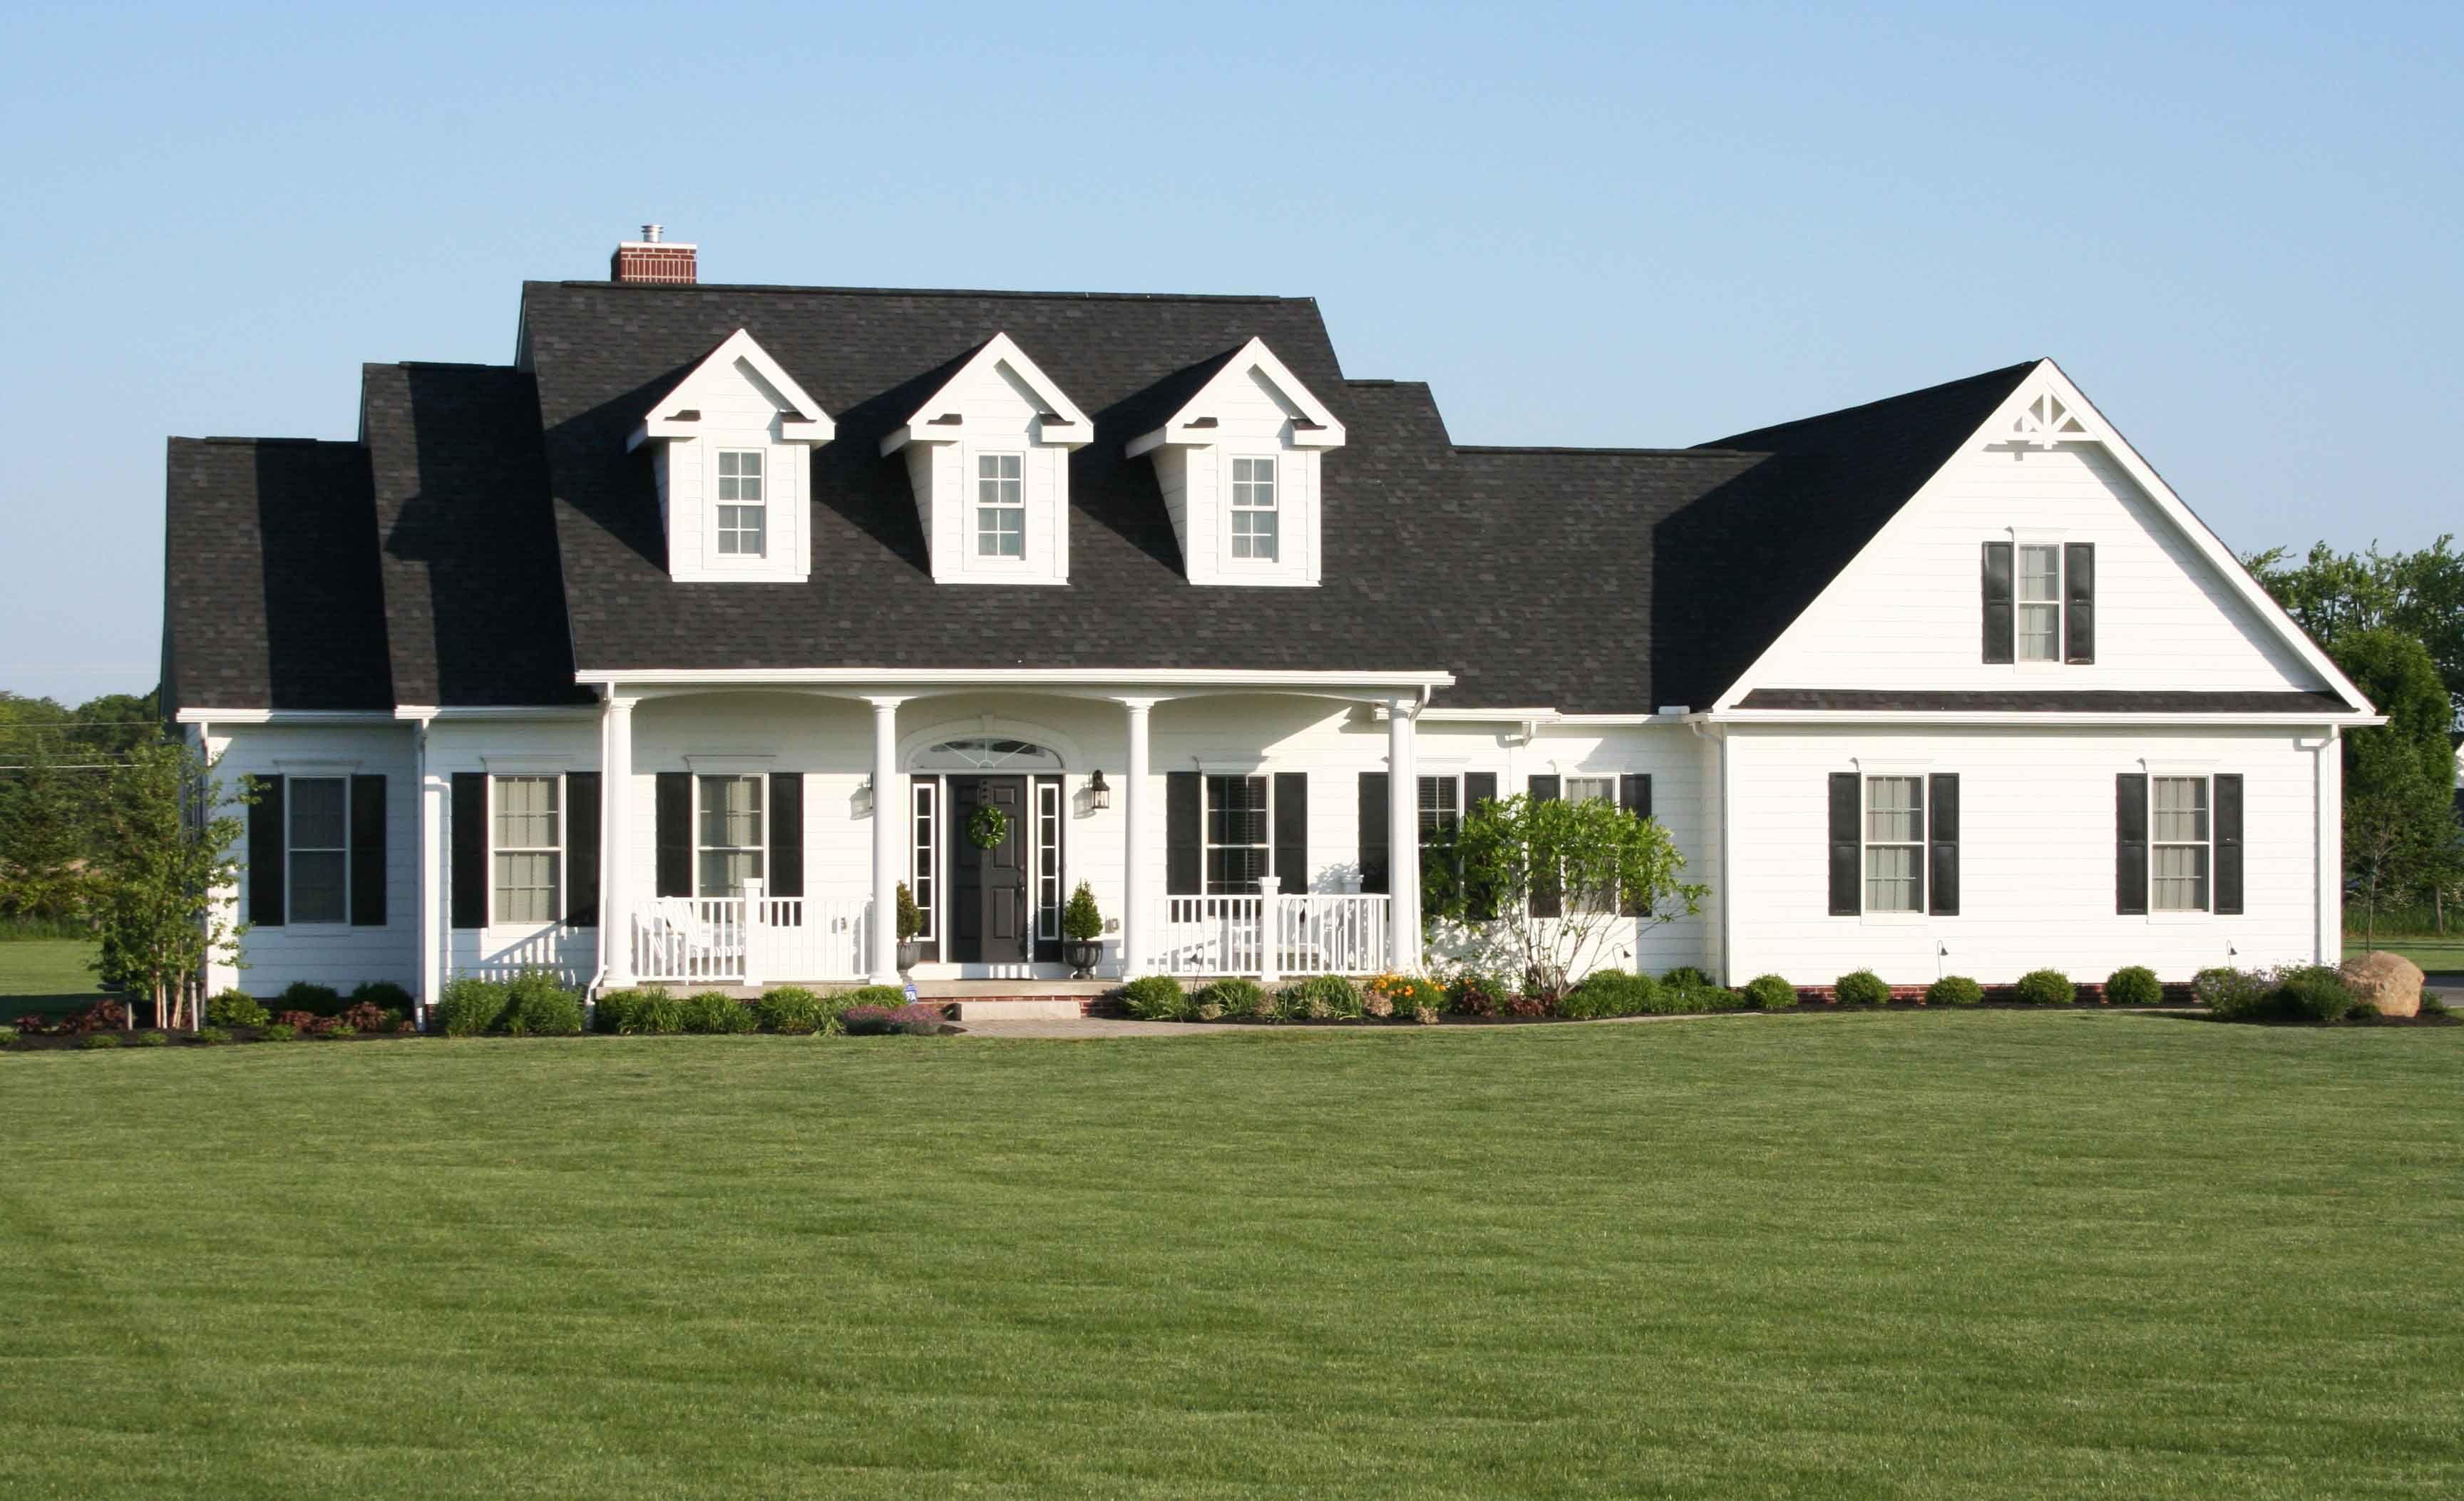 Dream Home Plans The Classic Cape Cod Cape Cod House Exterior